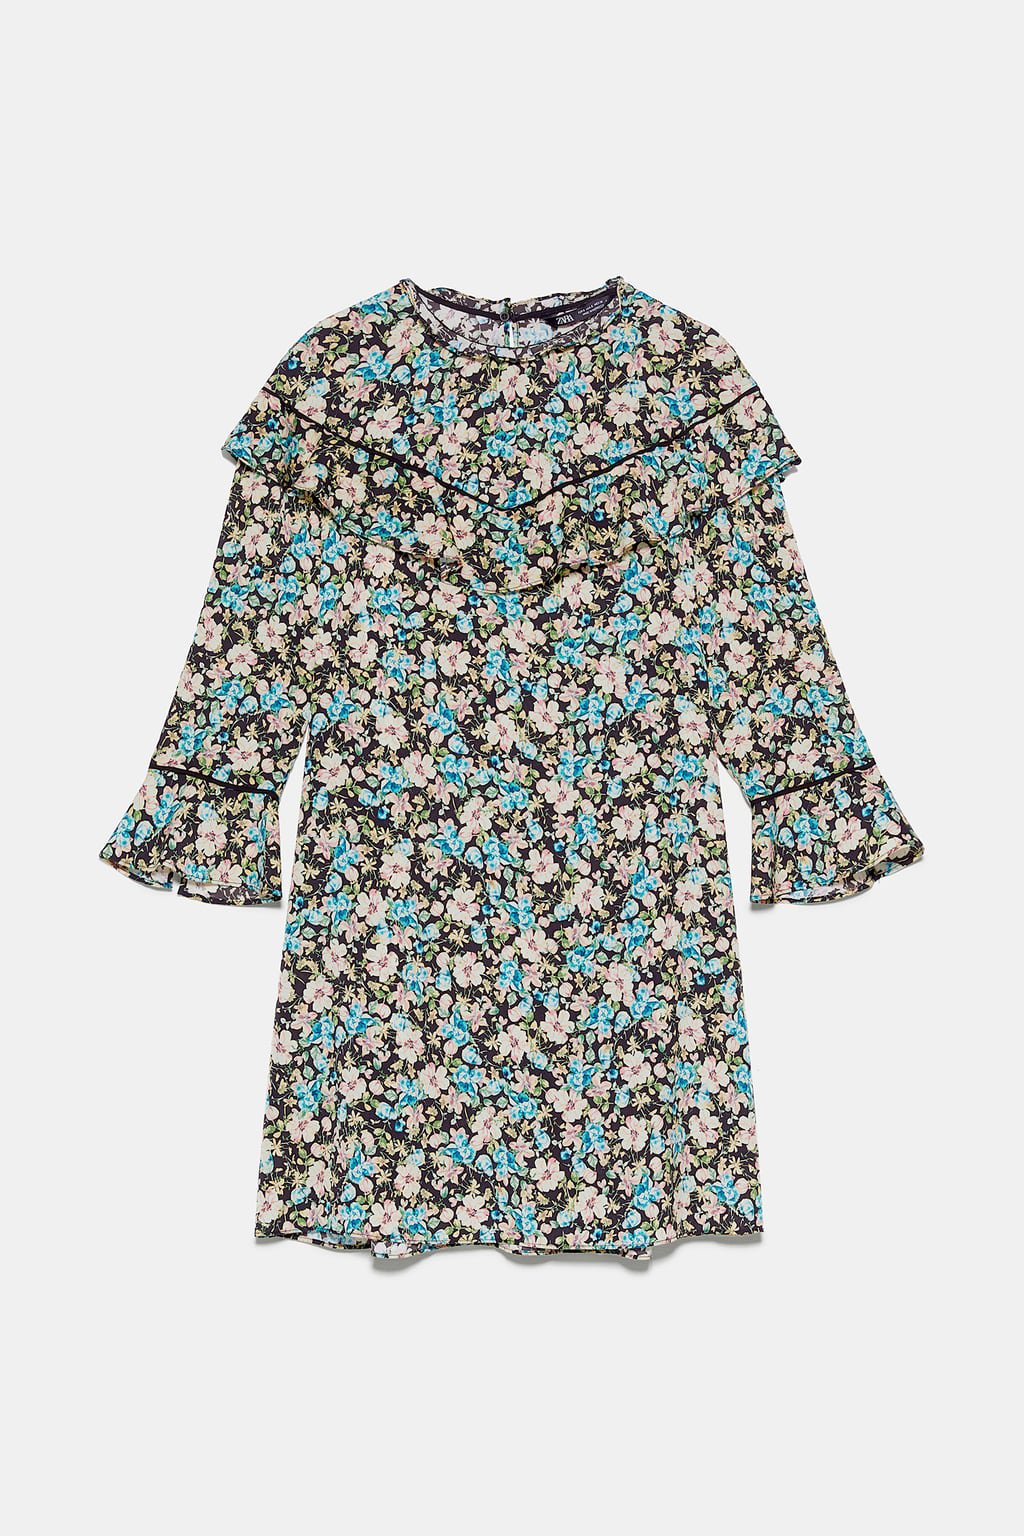 FLORAL PRINT DRESS - NEW IN-WOMAN | ZARA United States blue